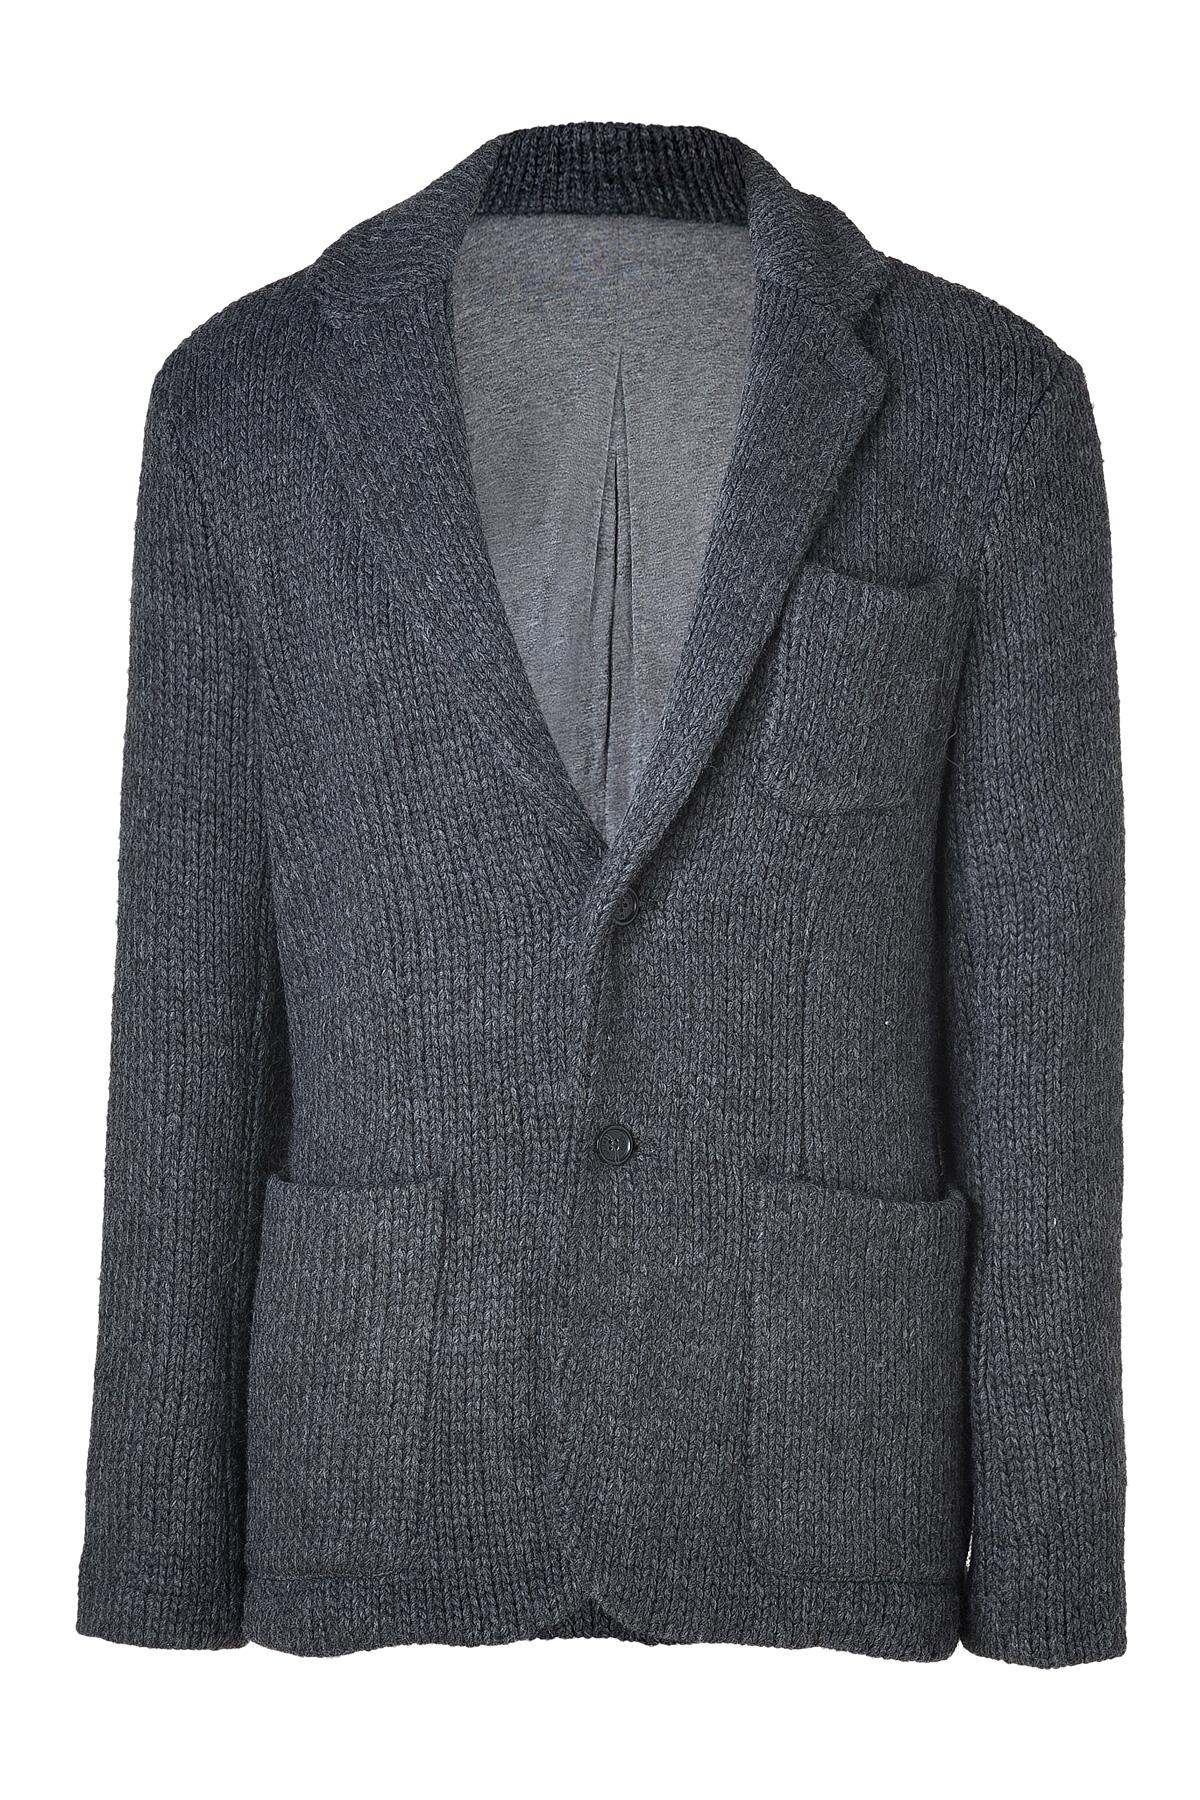 Michael Kors Charcoal Chunky Knit Blazer In Gray For Men